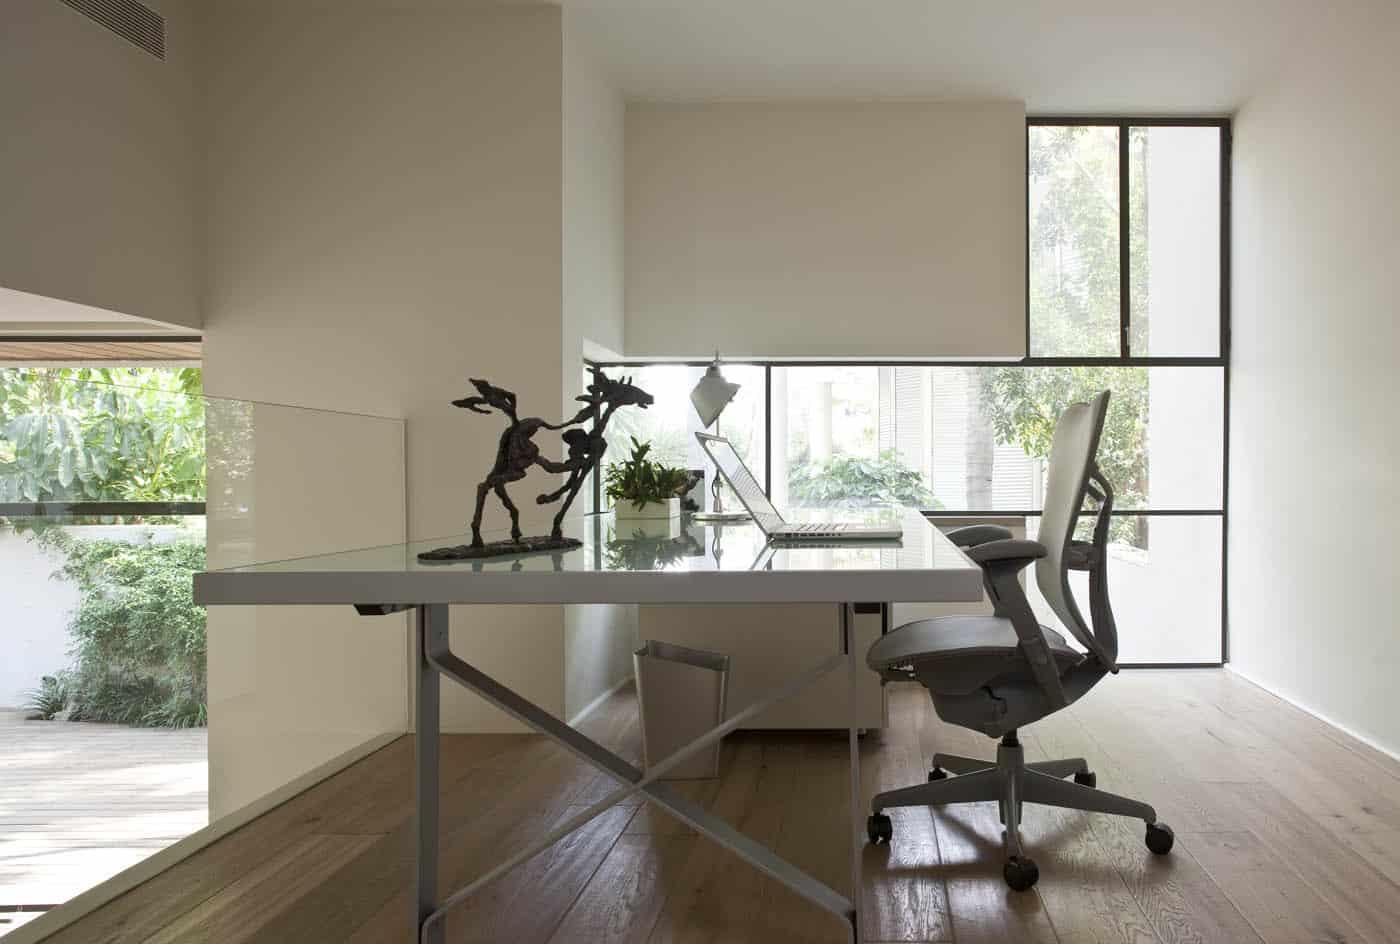 K-House by Paz Gersh Architects (17)